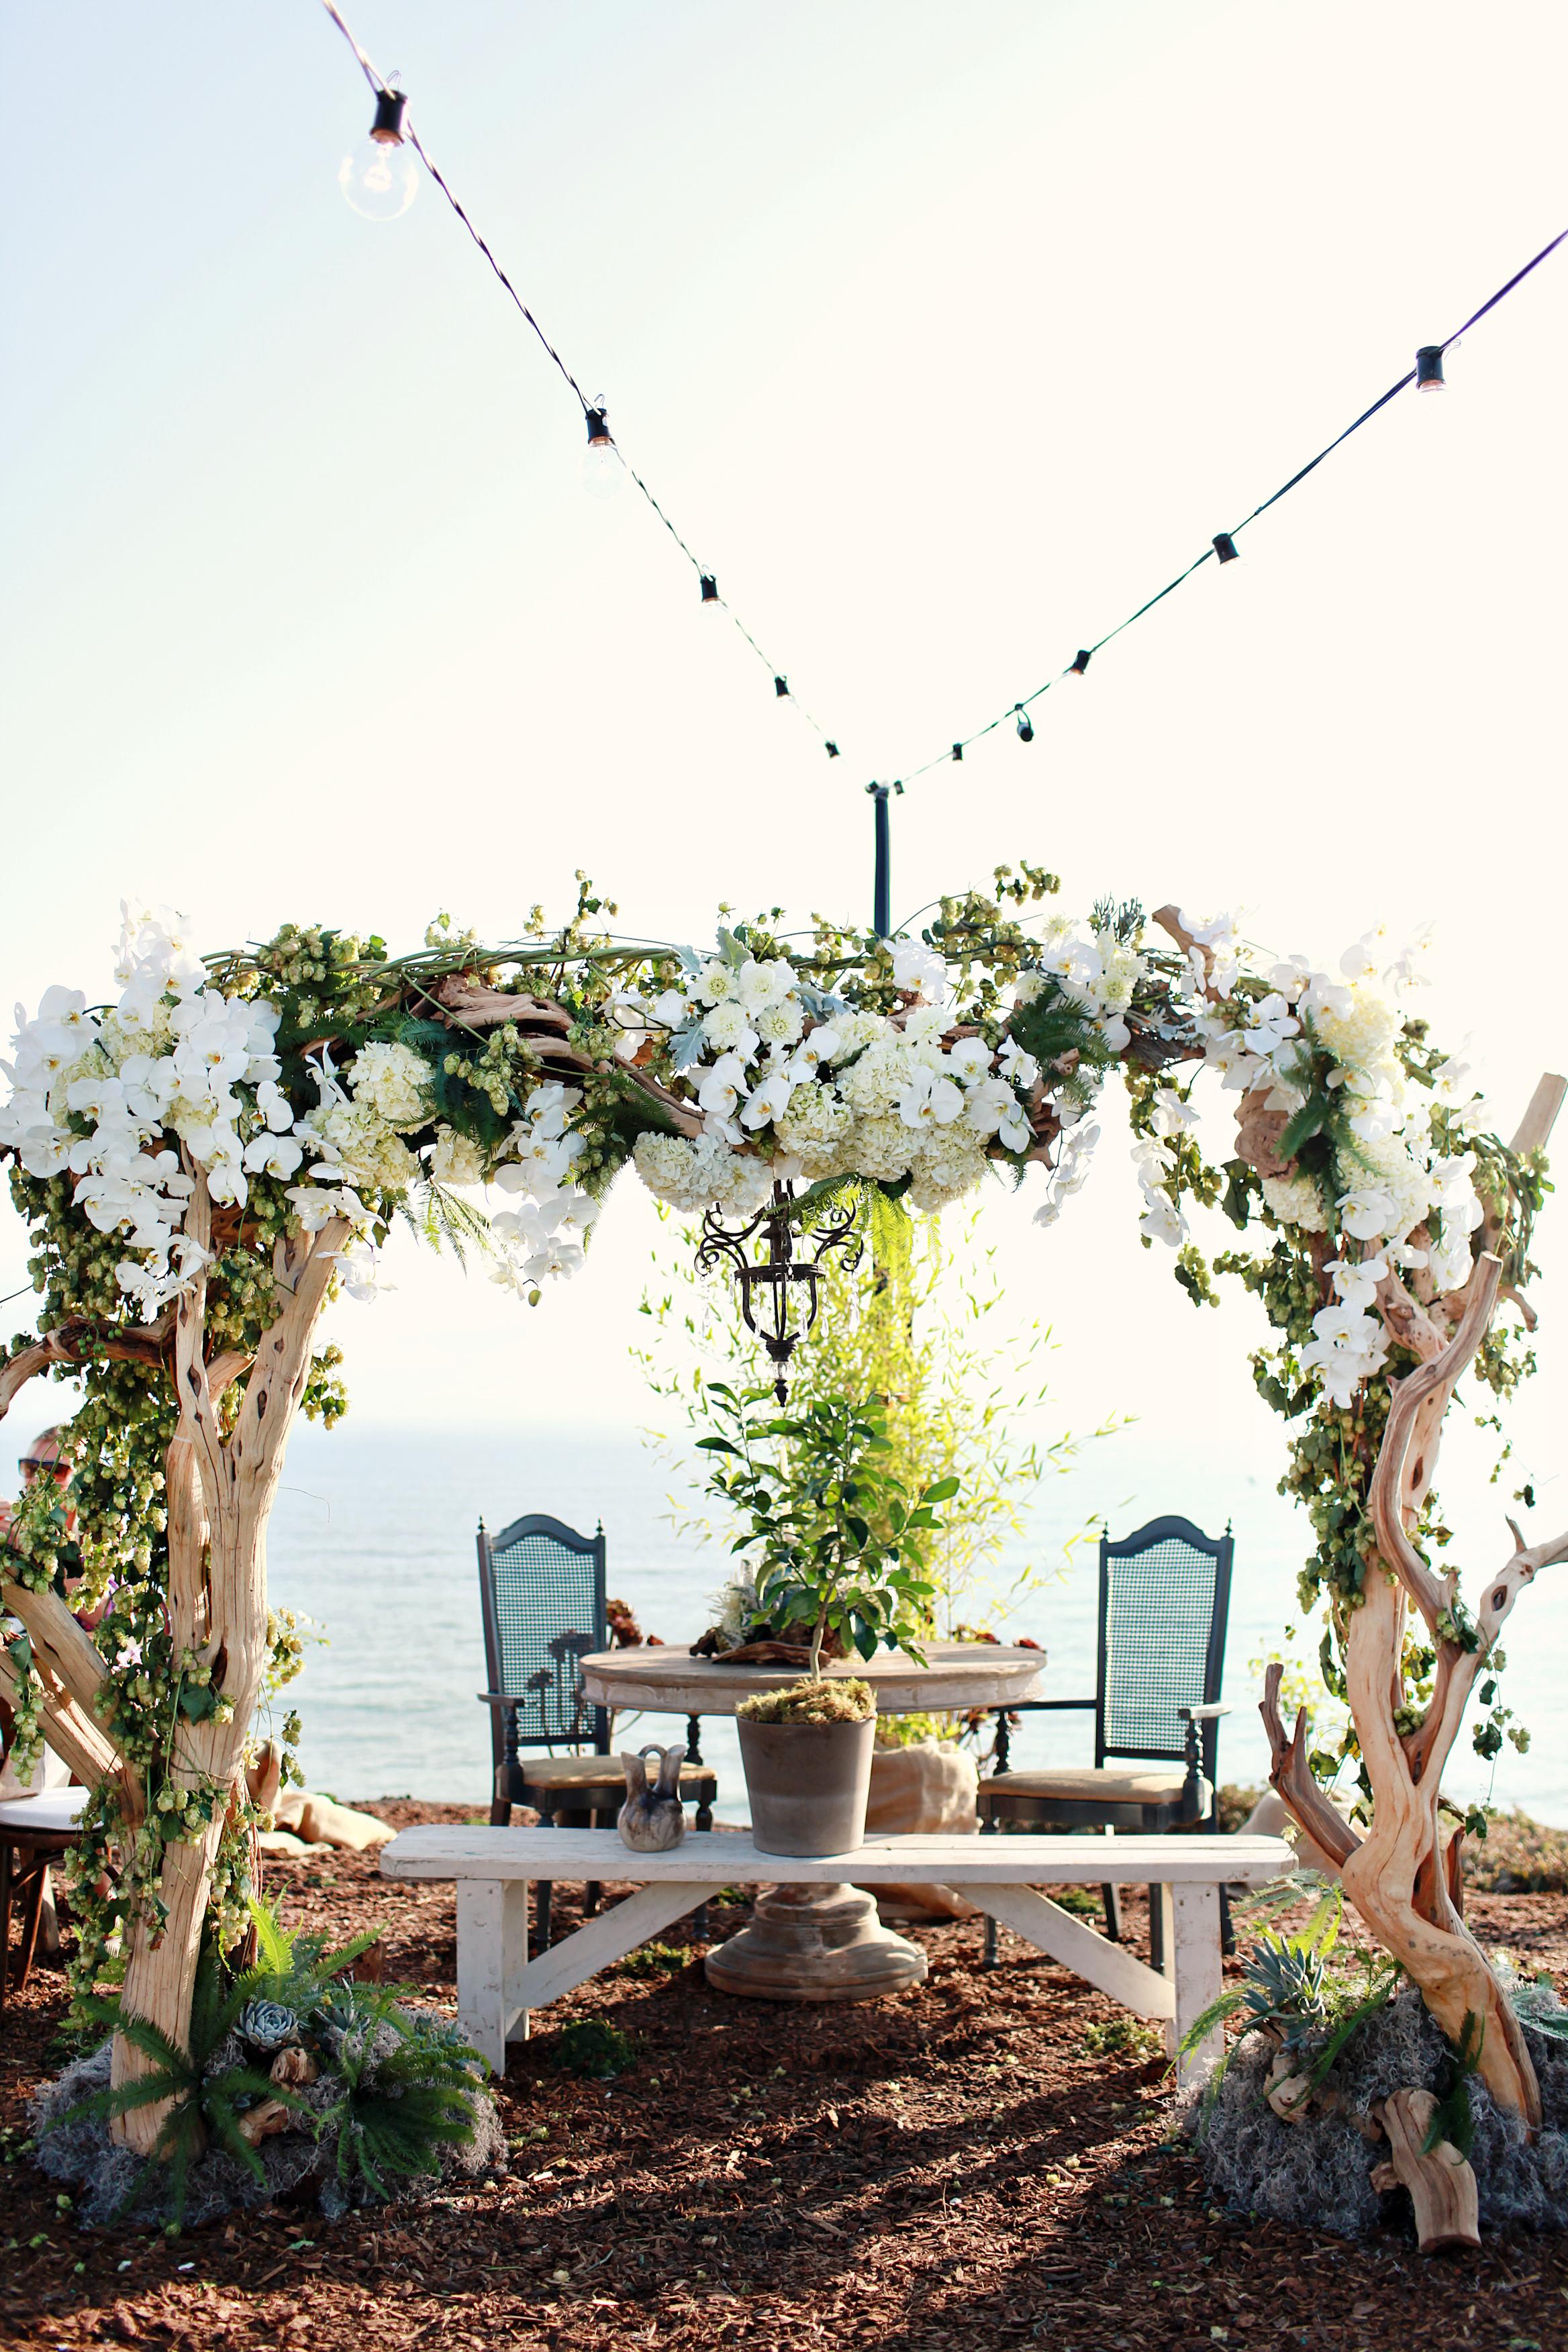 Nyki Ryan's Vintage Rustic Wedding